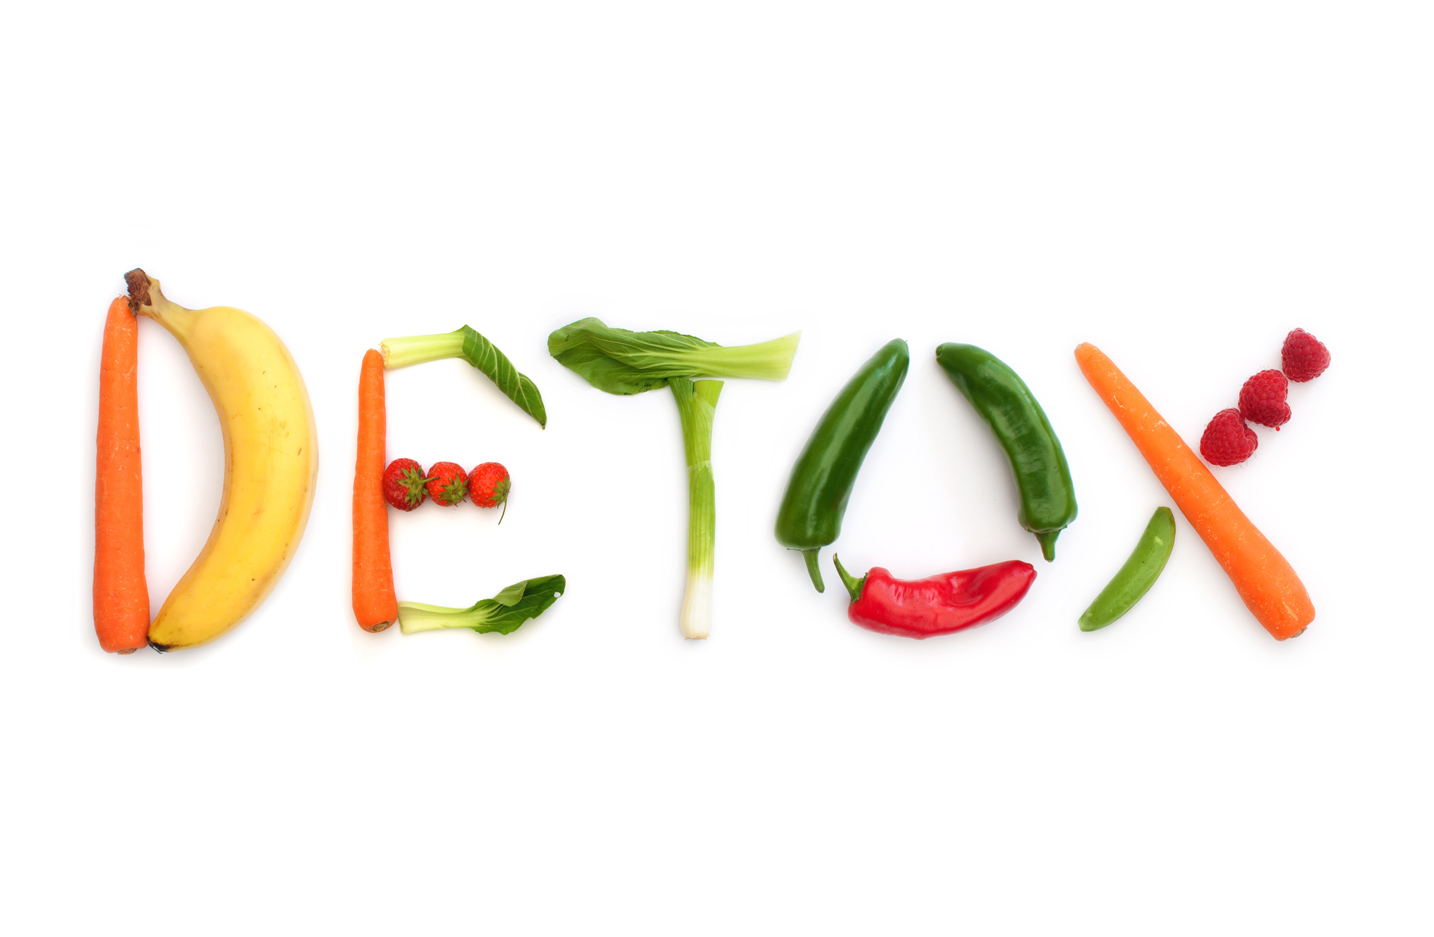 Detox in vegetables